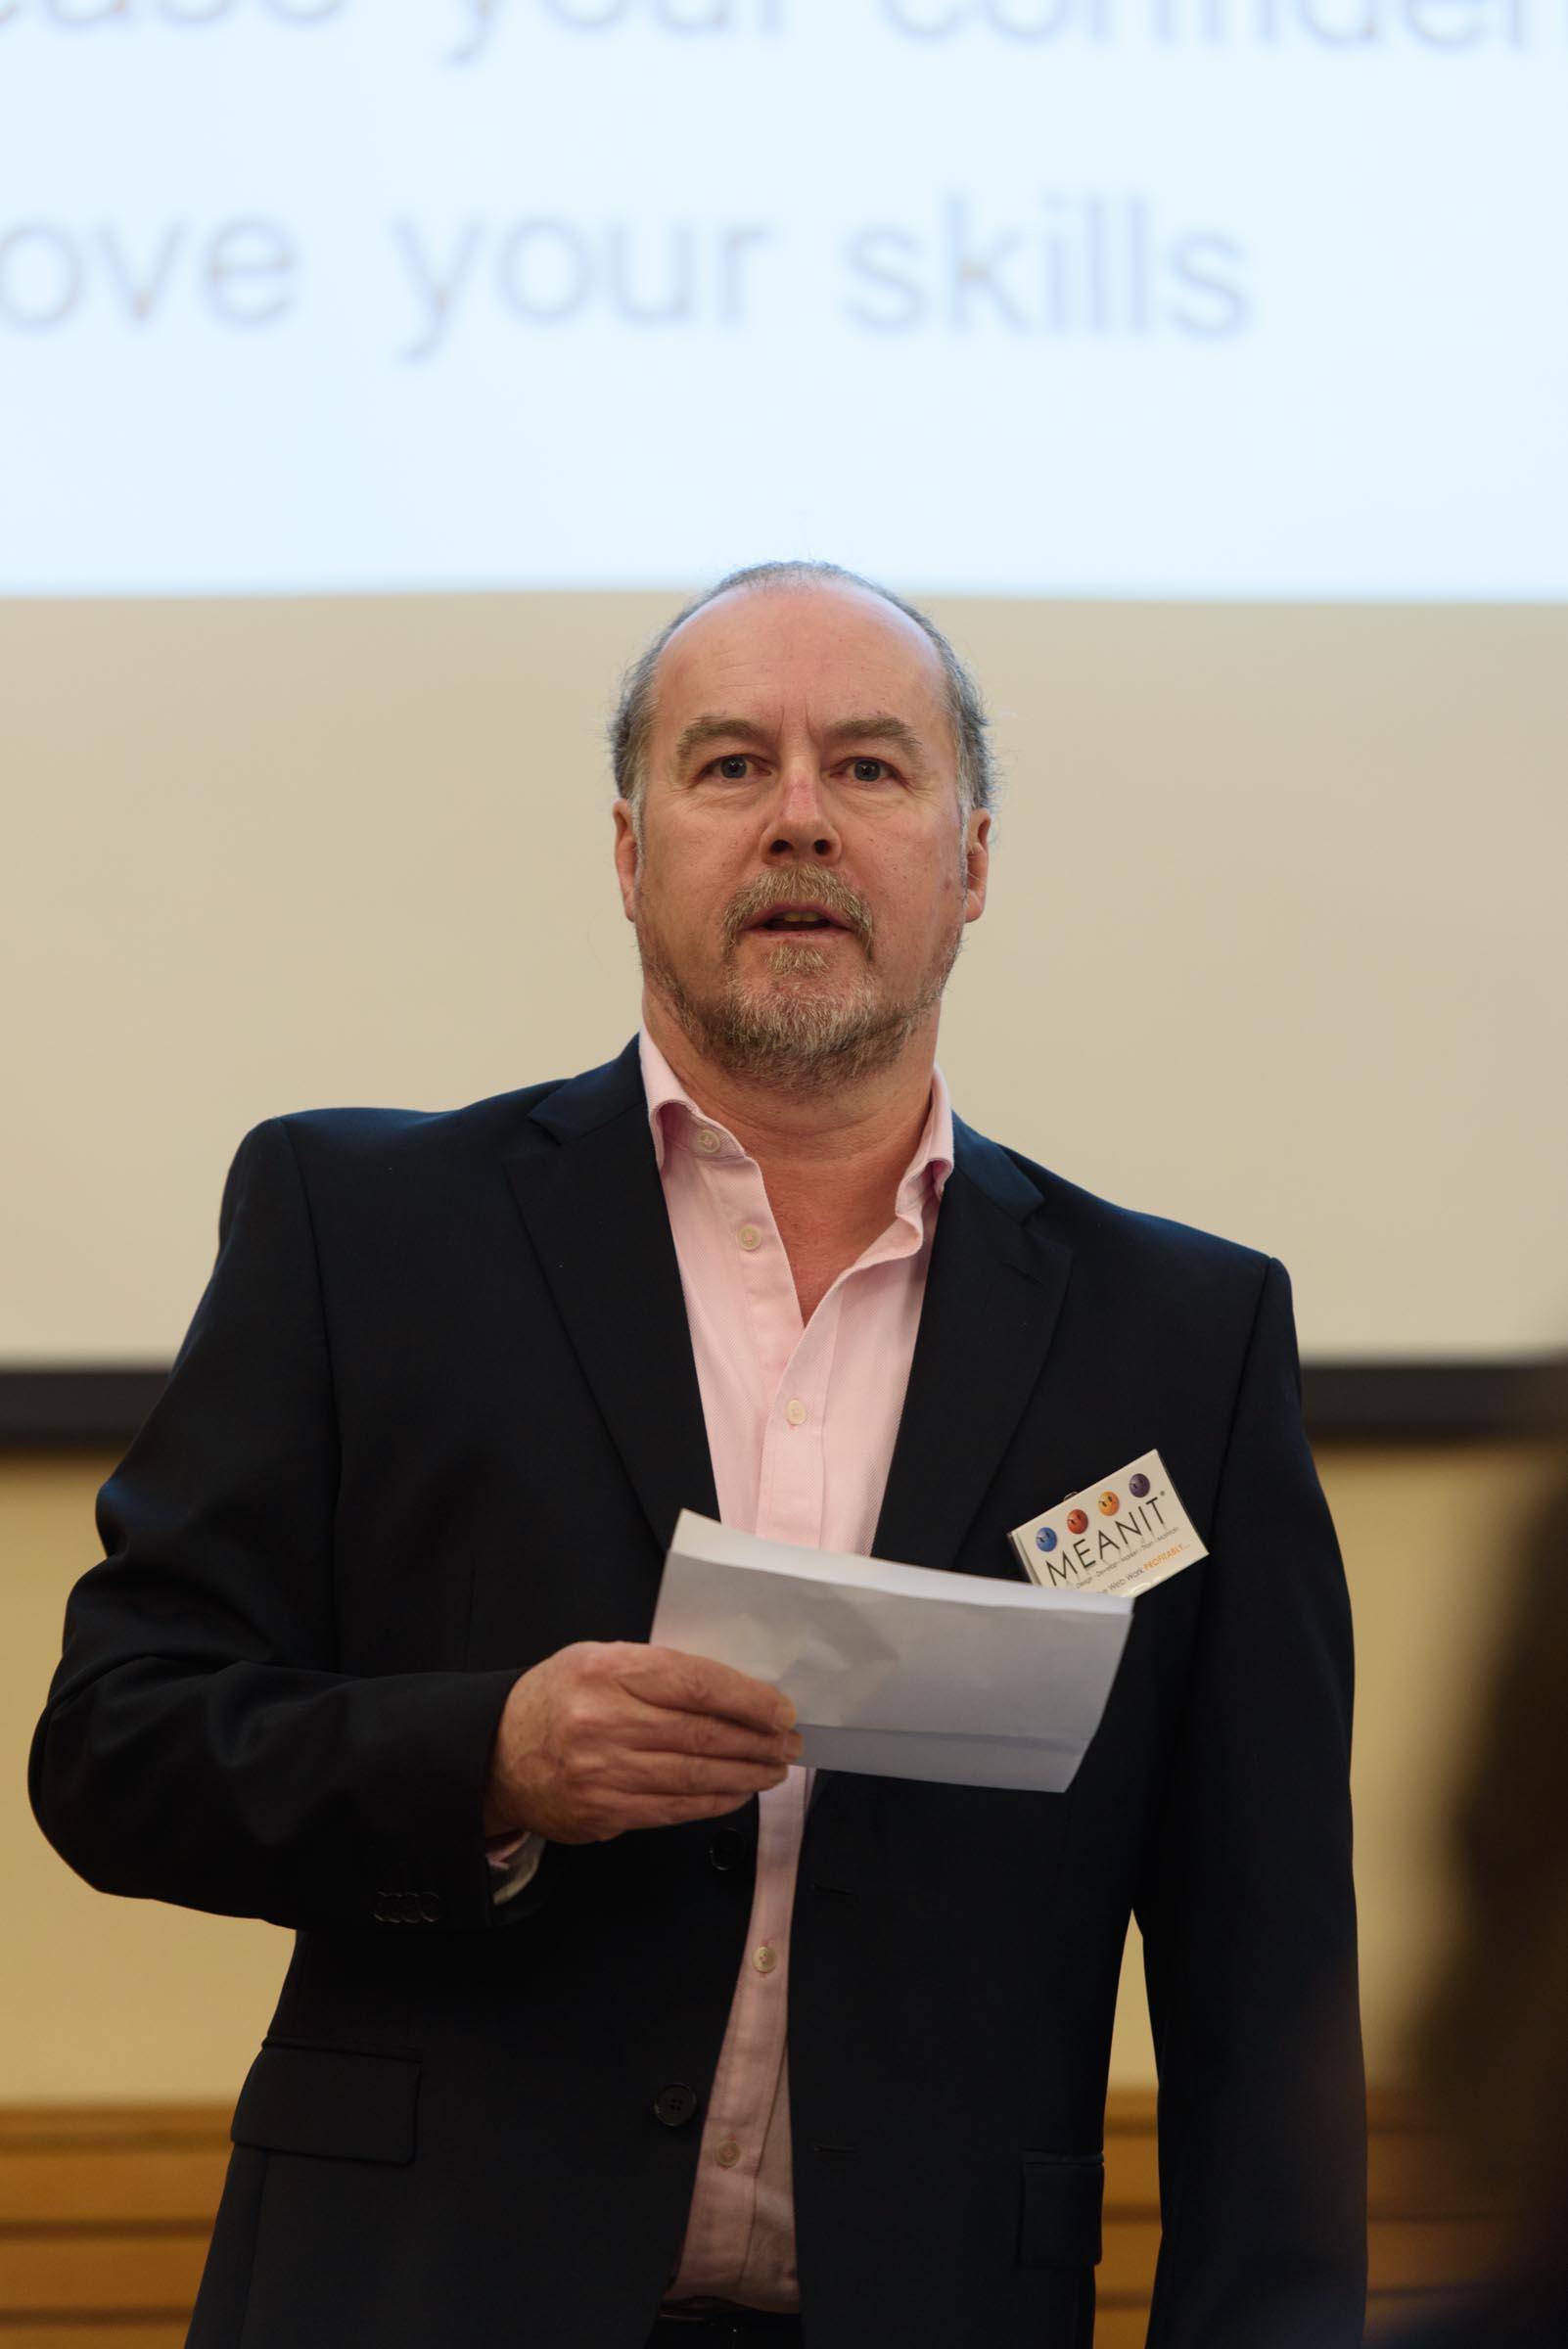 Michael_MacGinty_GDPR_Compliance